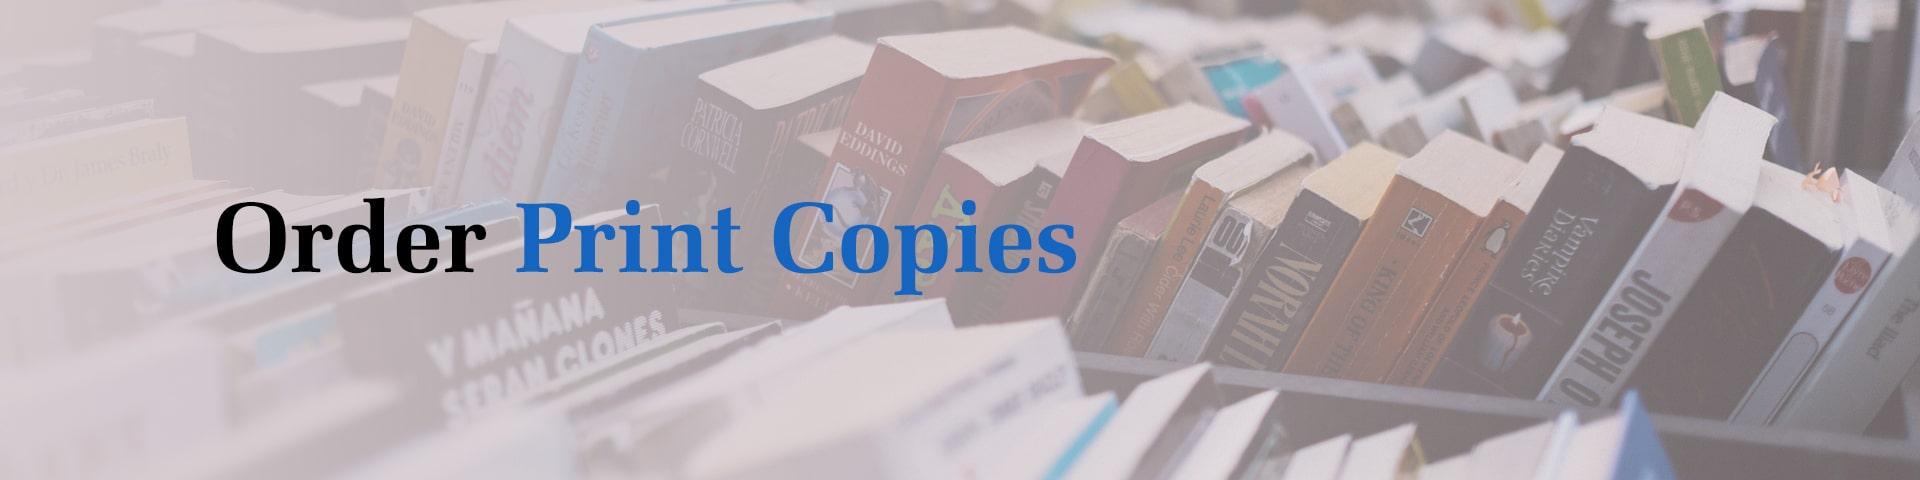 Order Print Copies